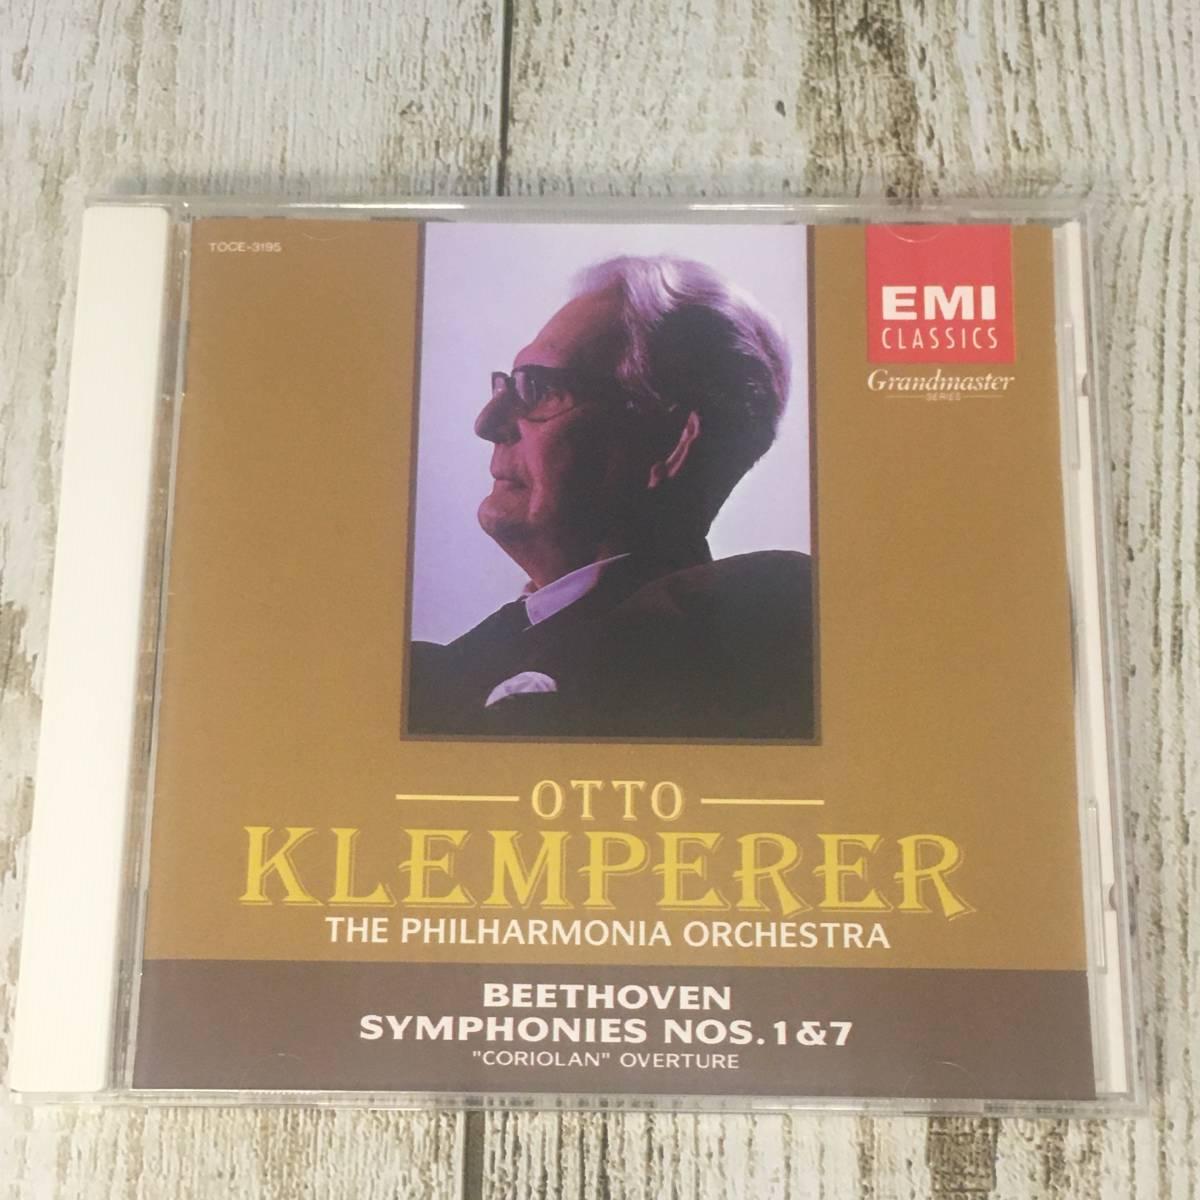 2-11A33「中古CD」 ベートーヴェン 交響曲第1番&第7番 ● オットー・クレンペラー(指揮) フィルハーモニア管弦楽団 OTTO KLEMPERER_画像1